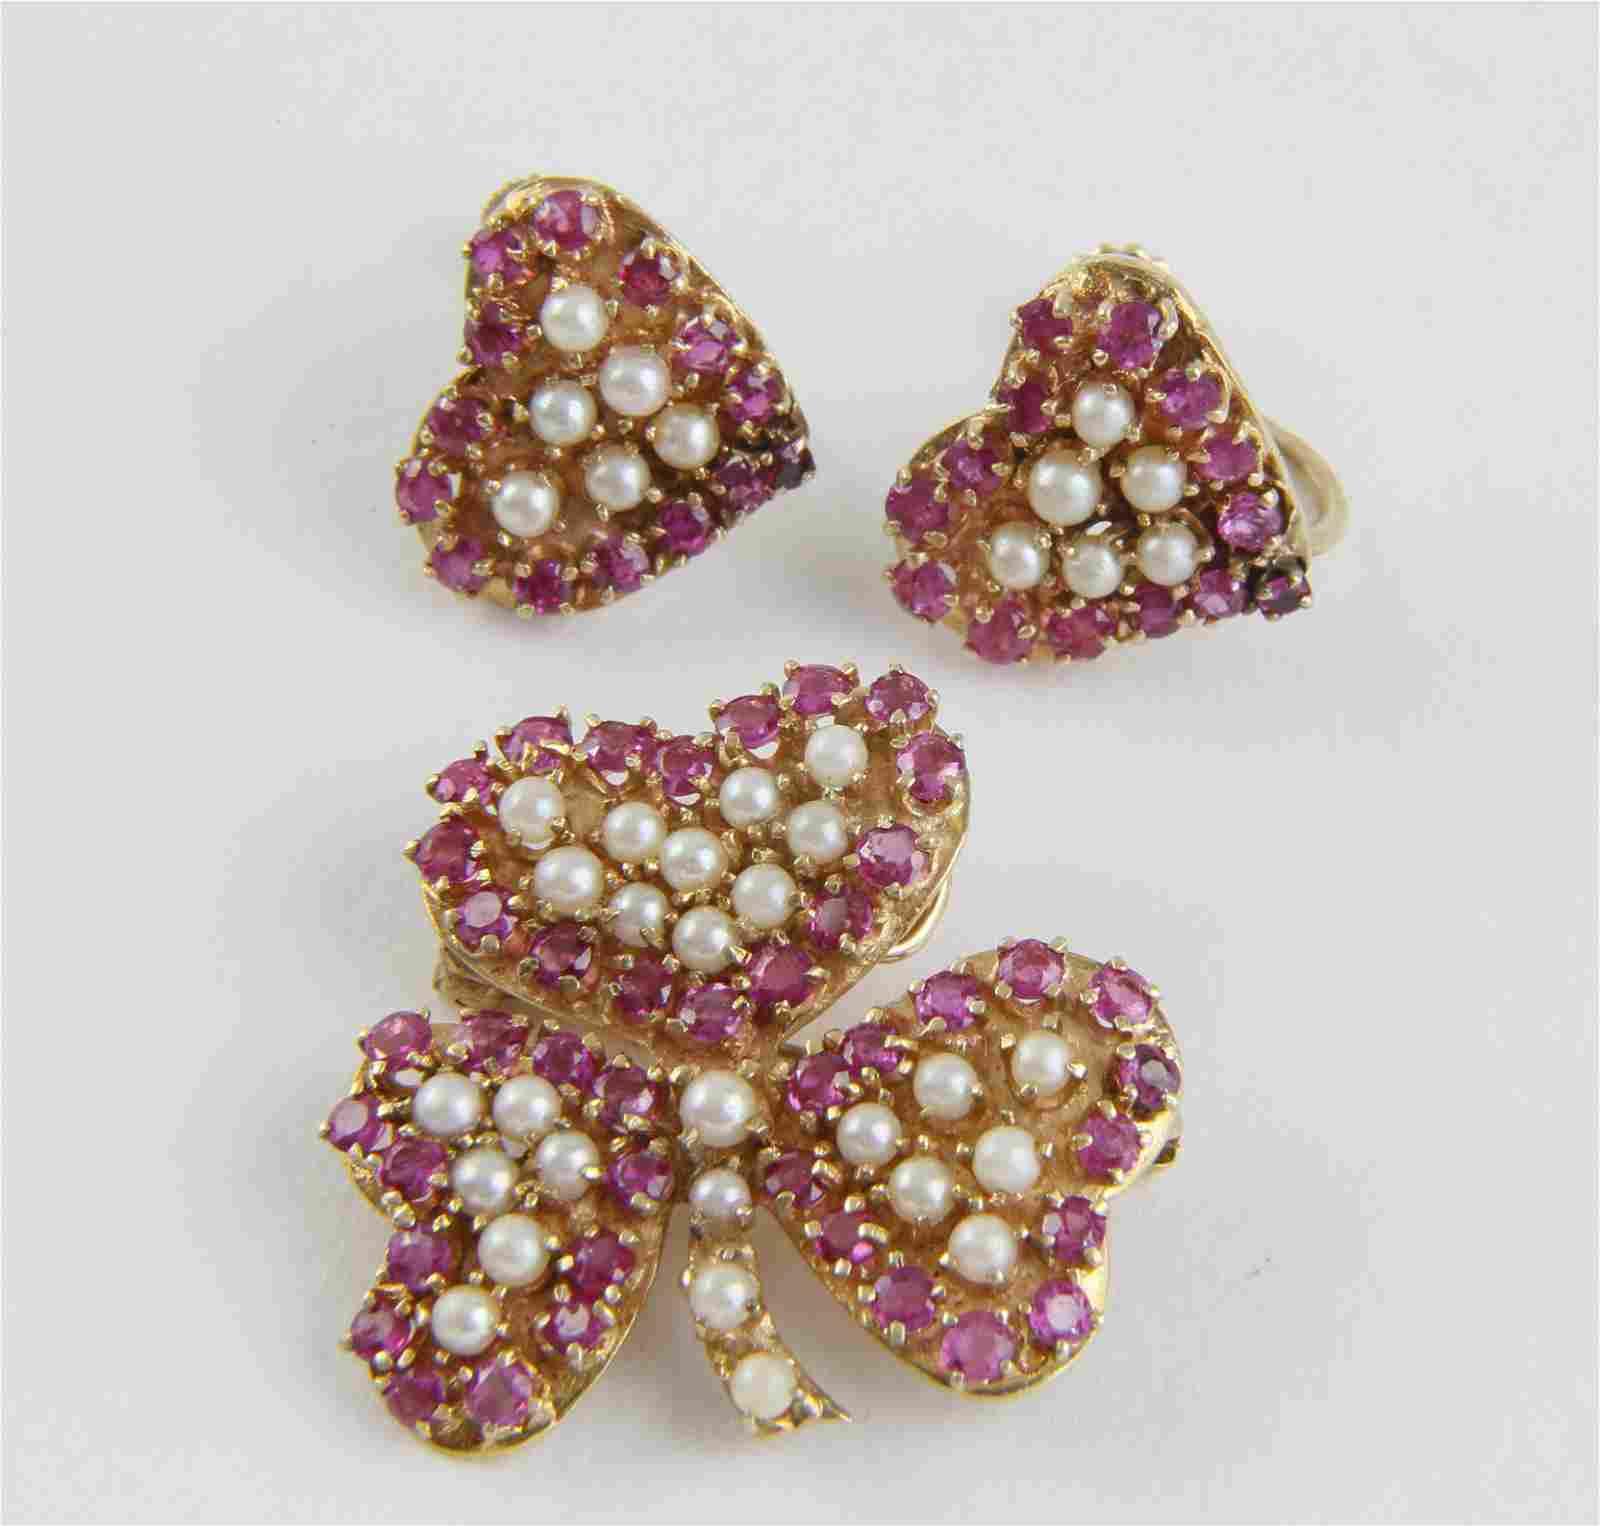 Three Piece Ruby, Pearl Brooch/Pendant, Earrings Set